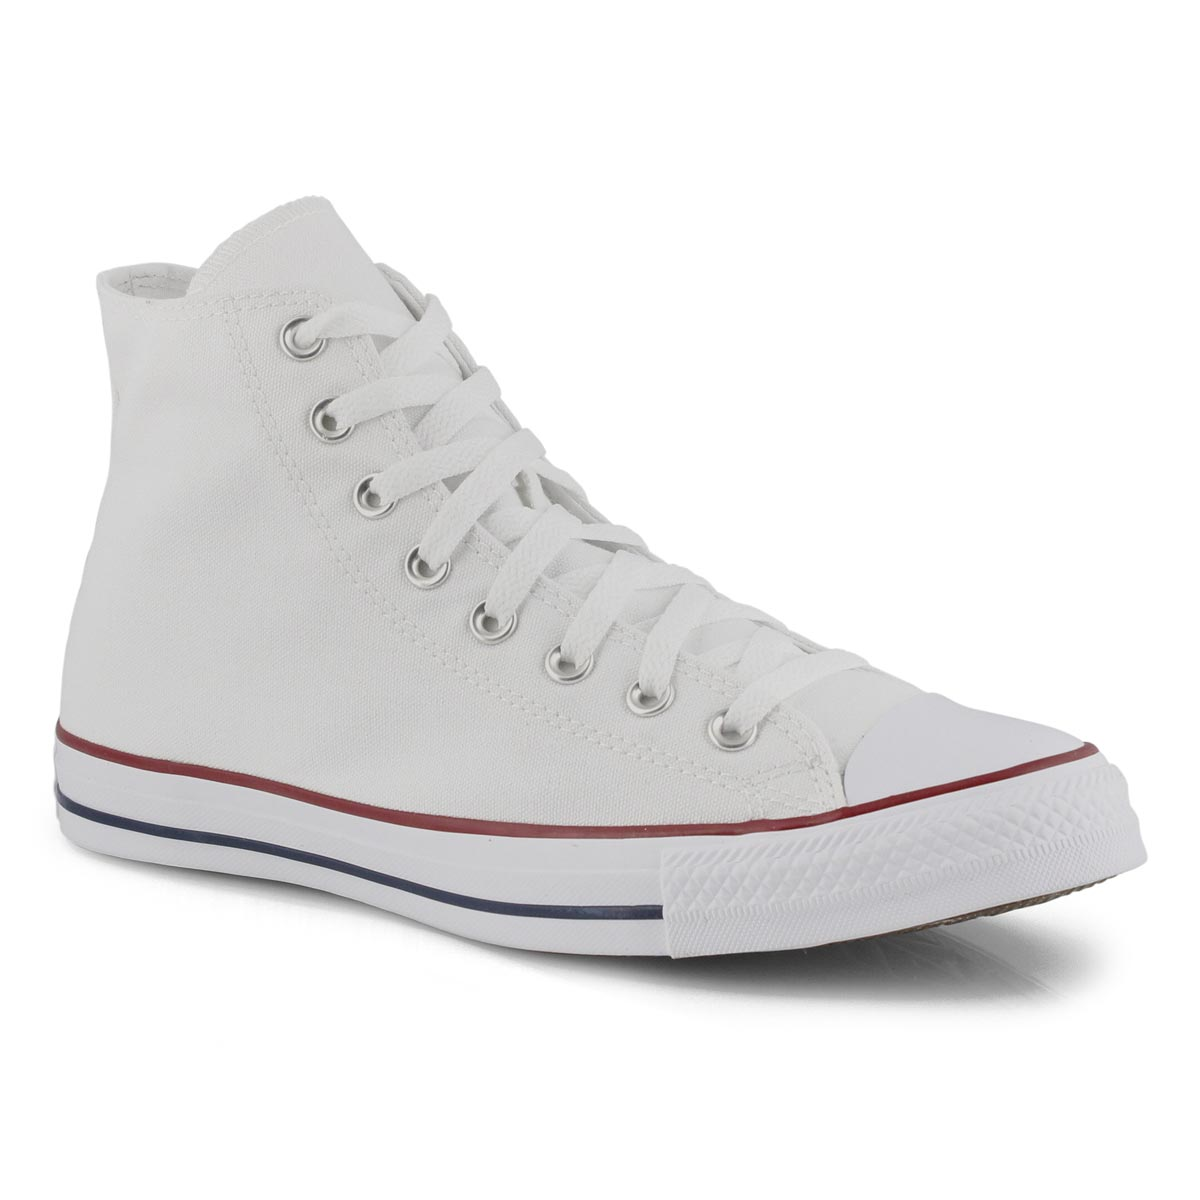 Mens Chuck Taylor white hi top sneakers